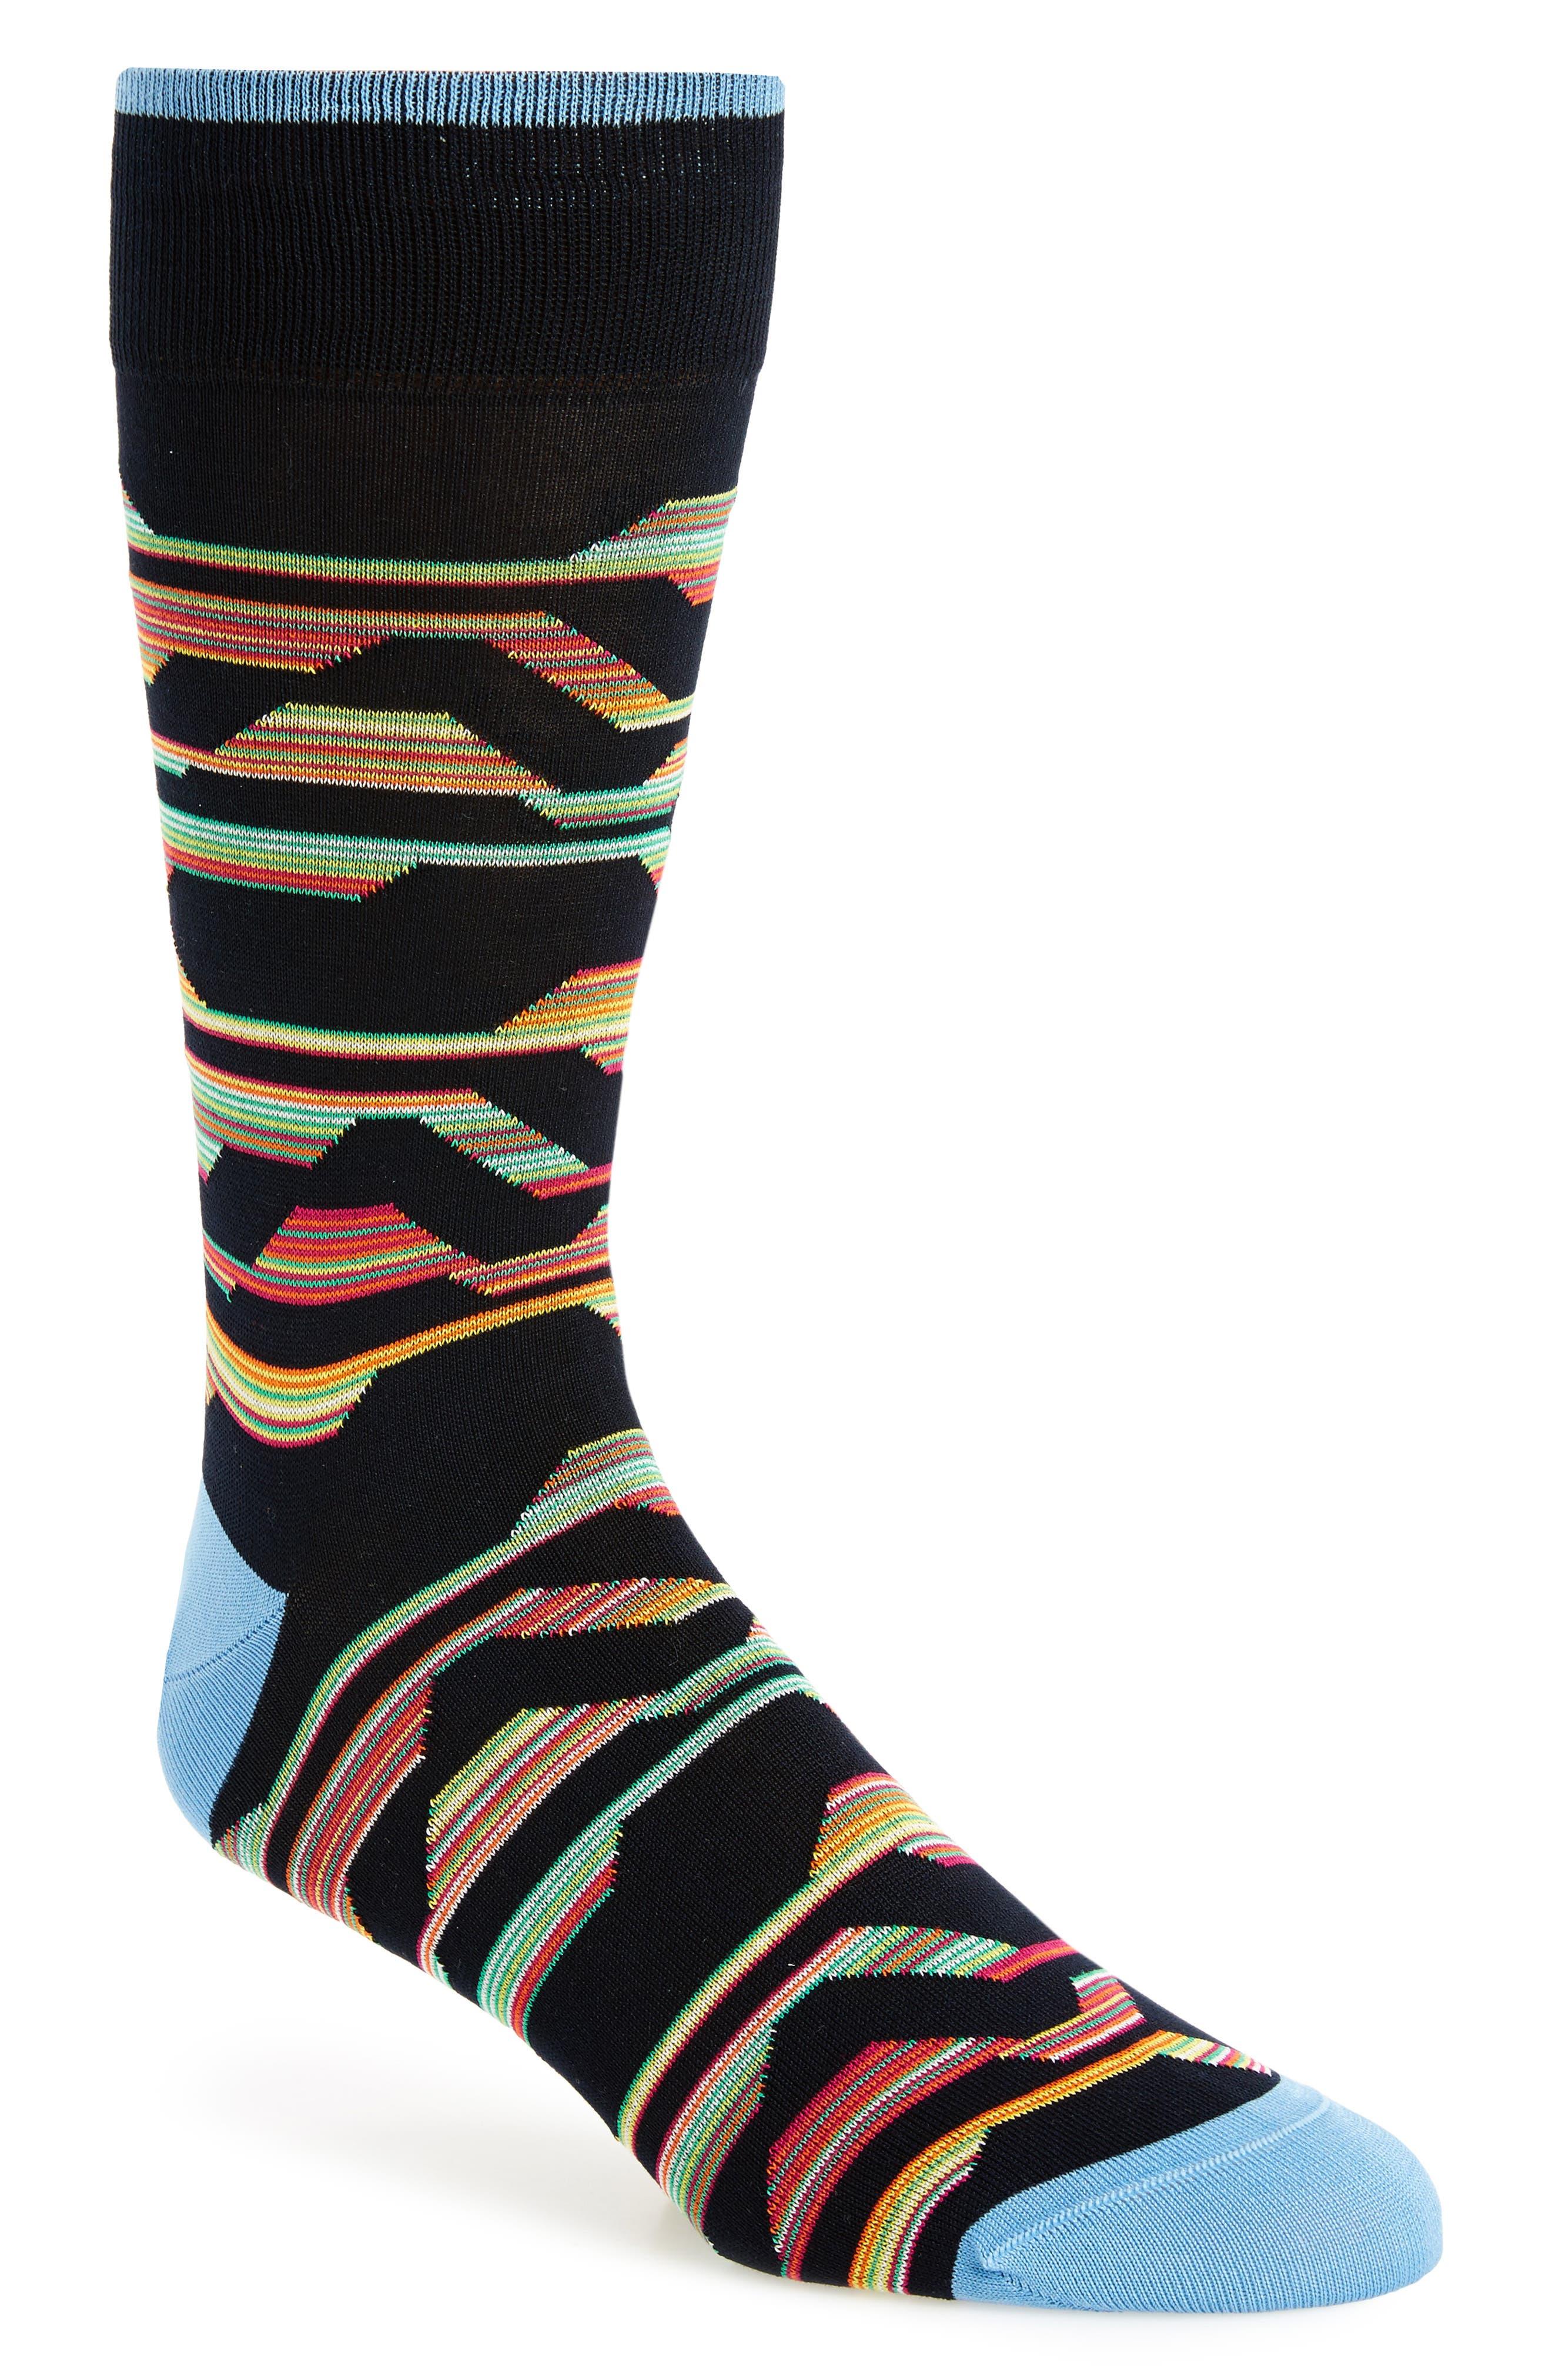 Mercerized Cotton Blend Socks,                         Main,                         color, Midnight